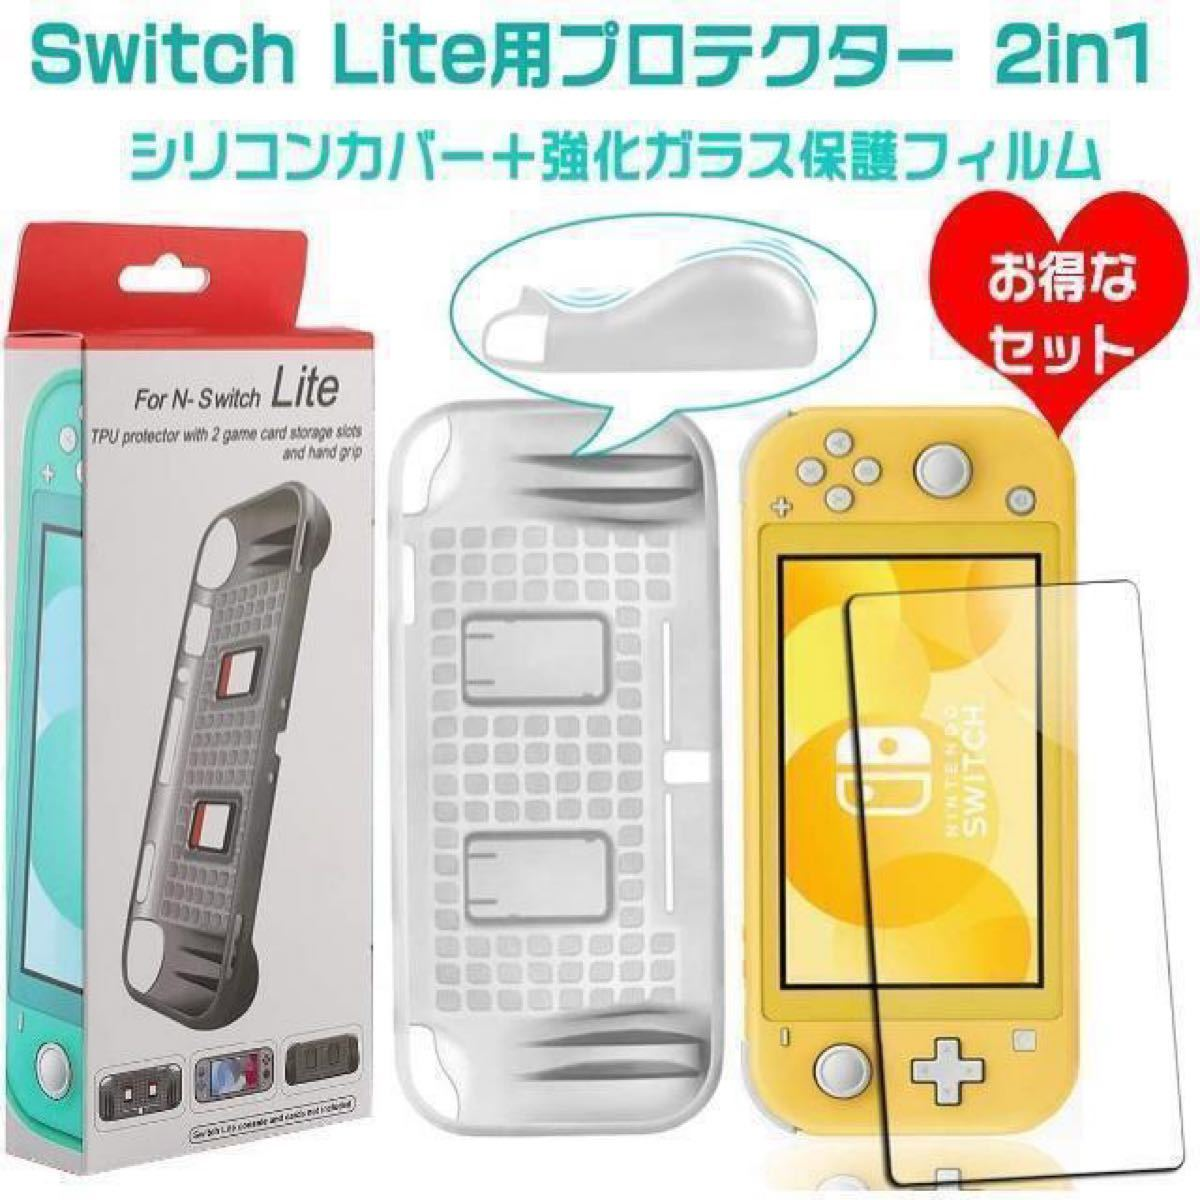 Nintendo Switch 保護フィルム ニンテンドースイッチ 任天堂スイッチ